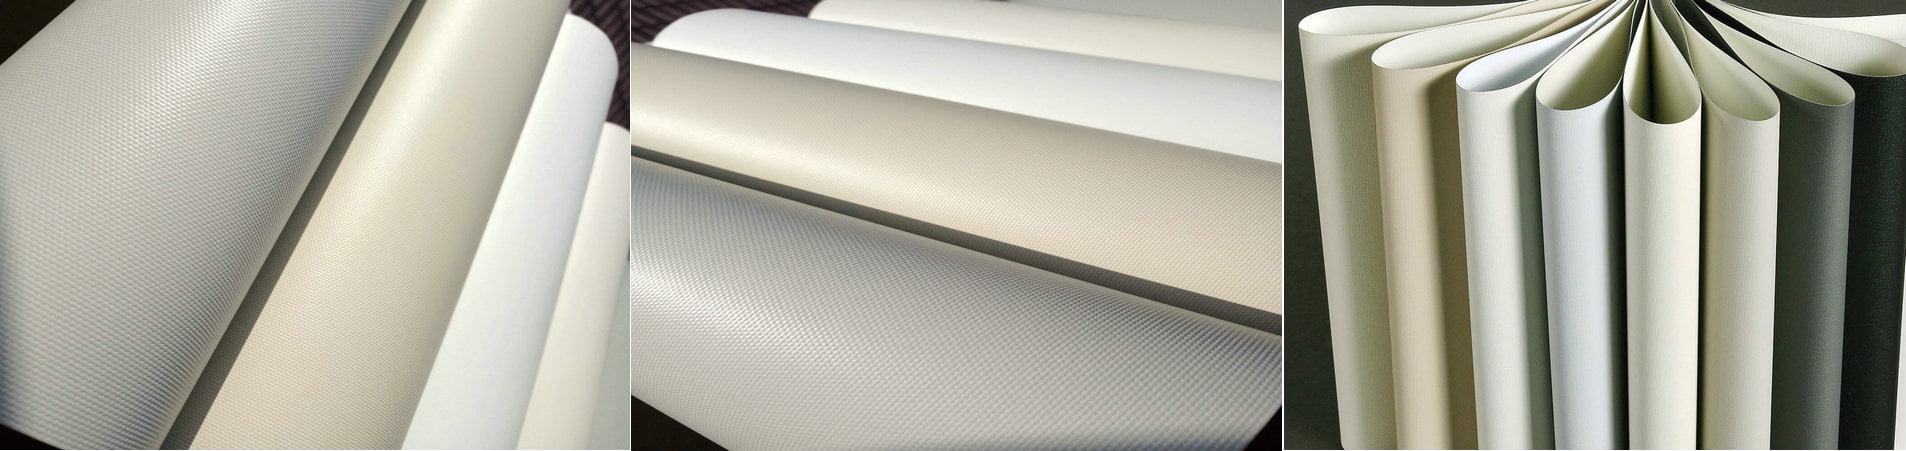 Fiberglass PVC Vinyl Blackout Blinds Fabric, Fiberglass PVC roller